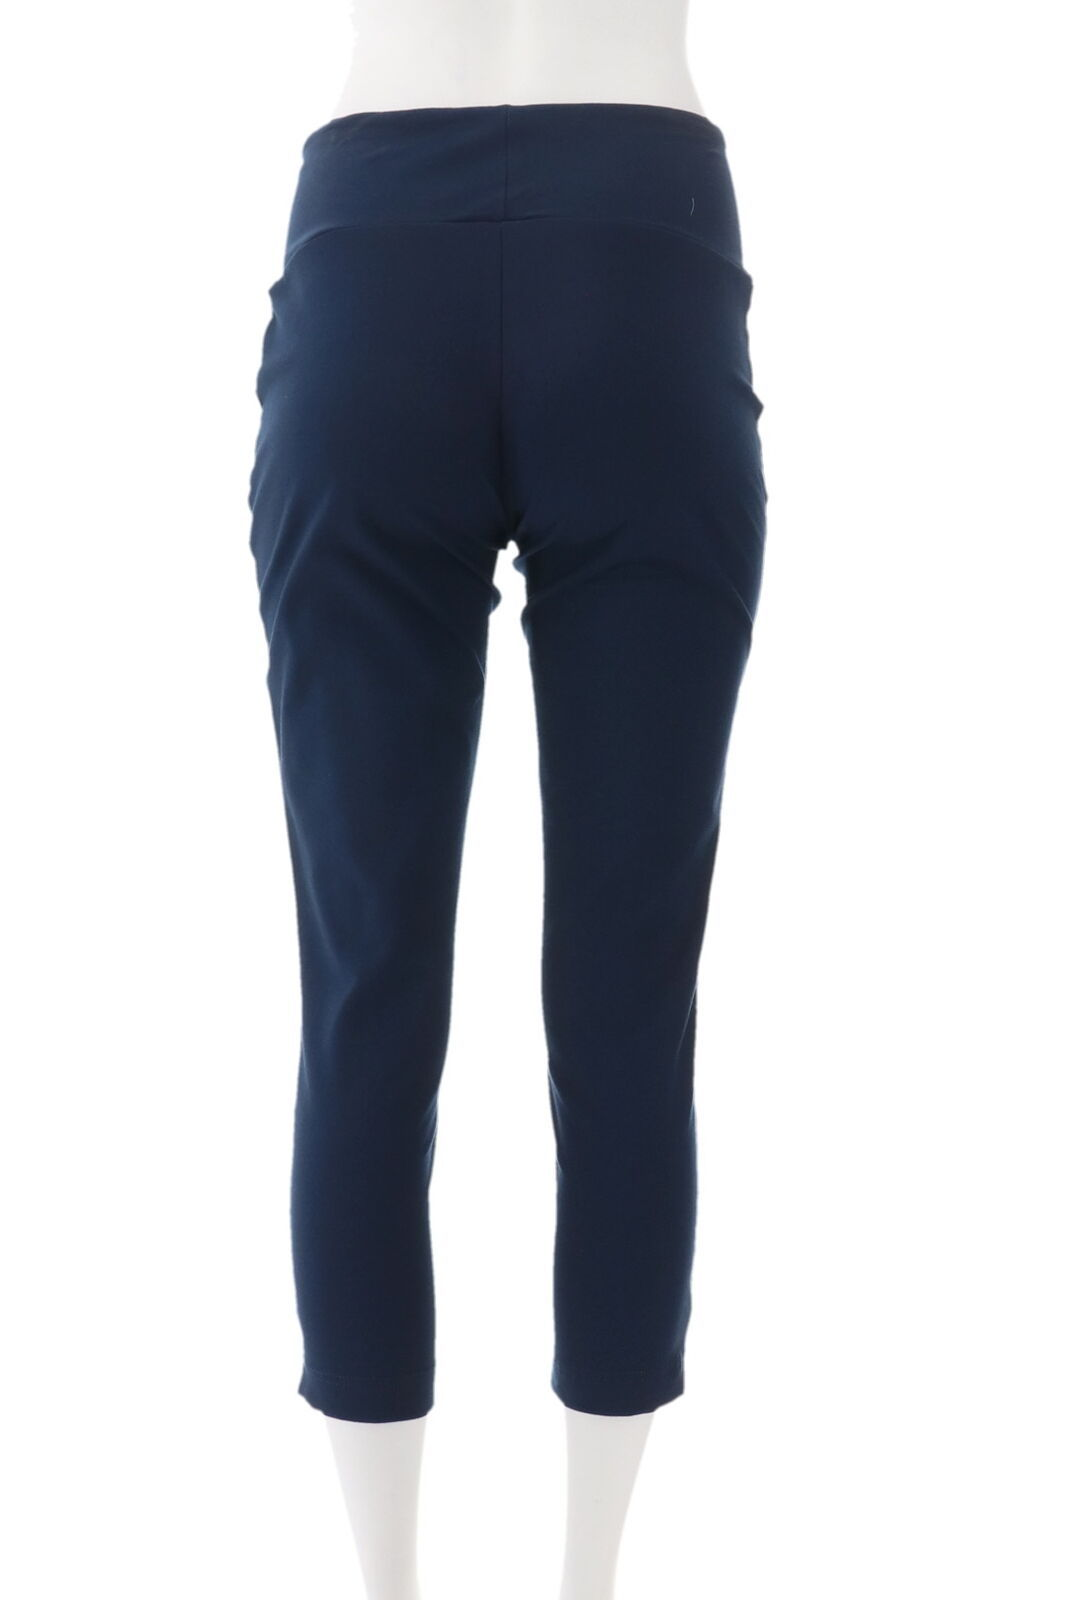 Women with Control Petite Tummy Control Set 2 Pants Captain Navy P2X NEW A344735